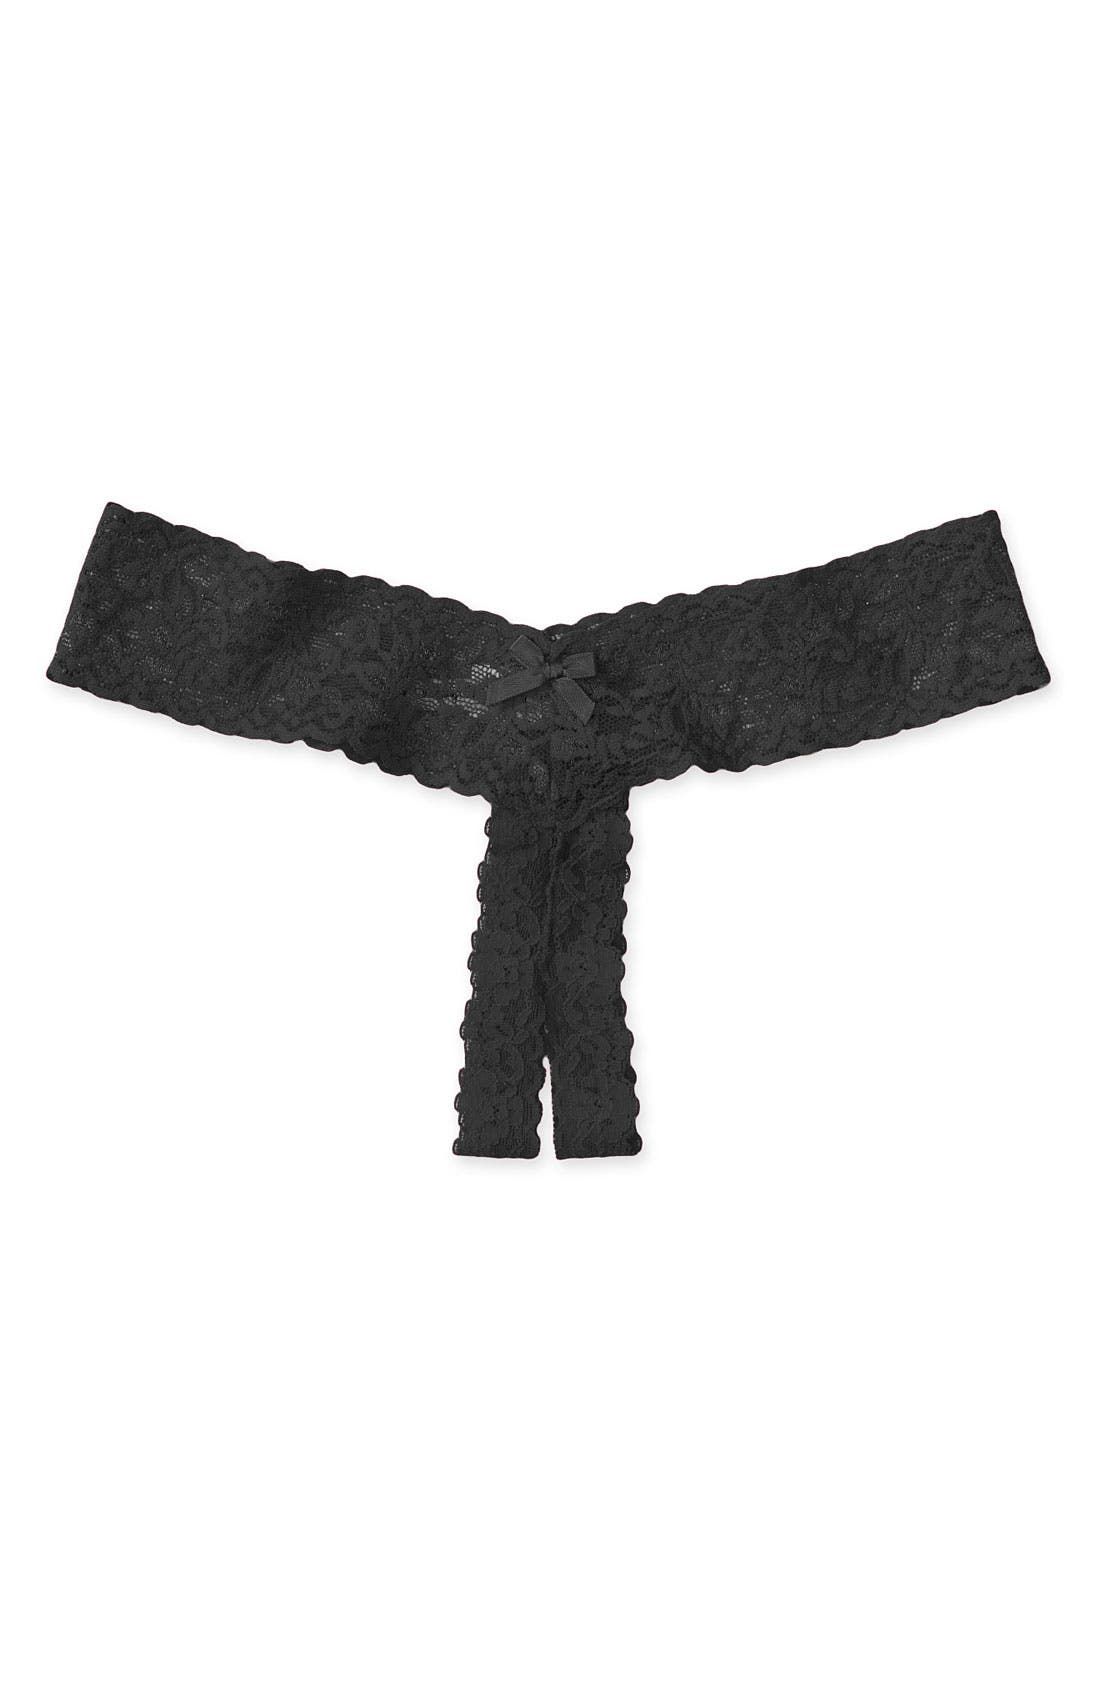 HANKY PANKY, Signature Lace Low Rise Thong, Main thumbnail 1, color, BLACK